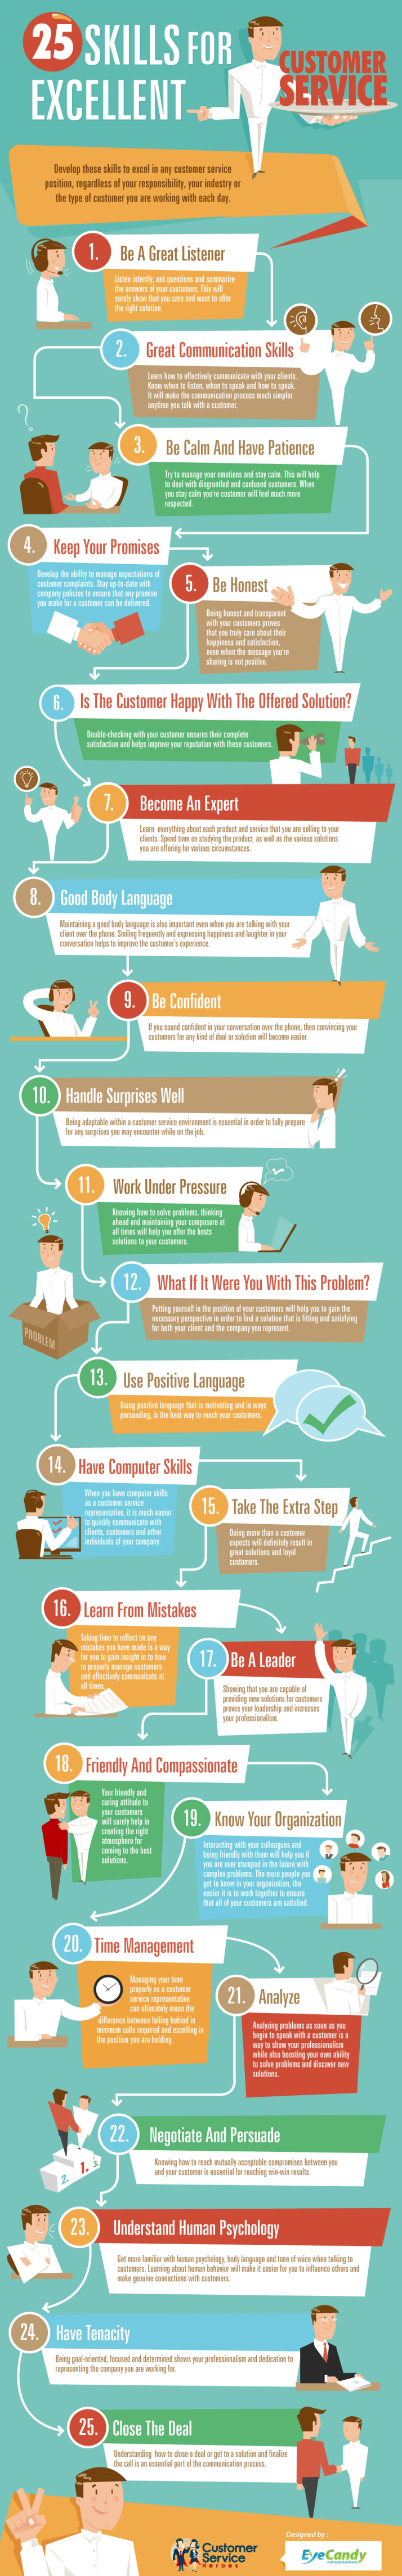 infografia_25_habilidades_sobre_servicio_al_cliente